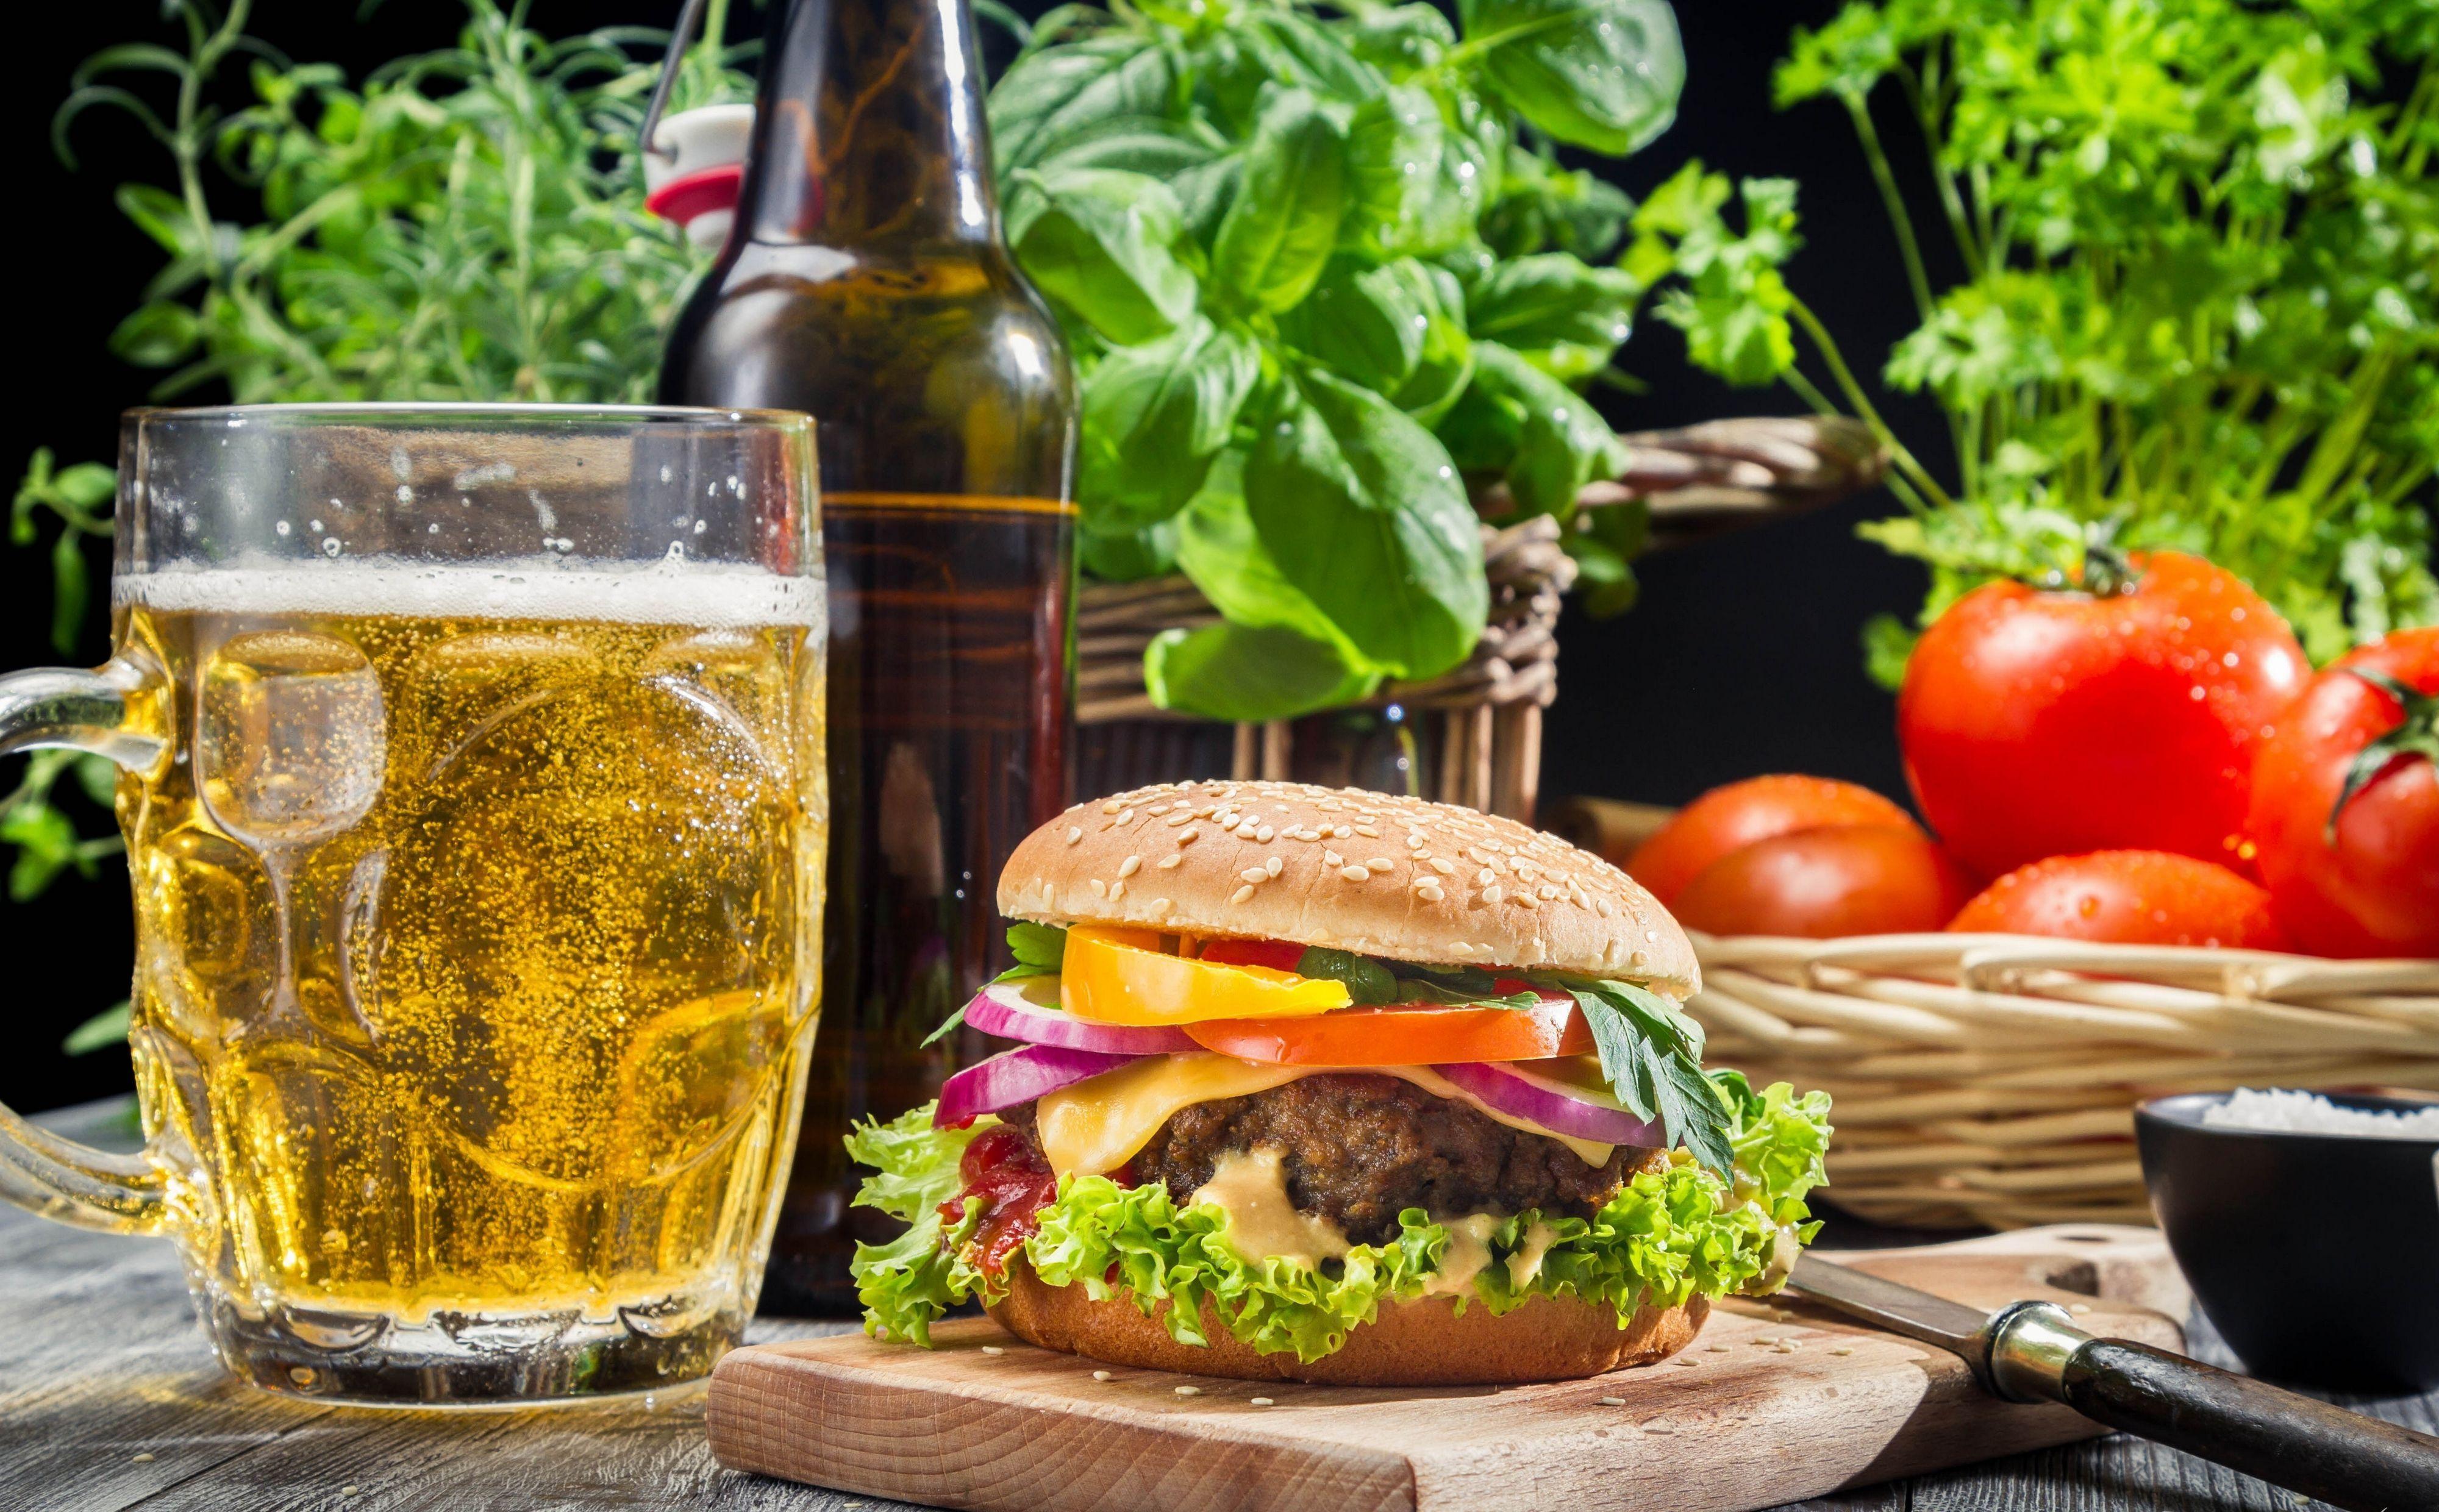 Most Inspiring Wallpaper High Quality Burger - ecd2997ff189ec801125c10865682dcf  Snapshot_169224.jpg